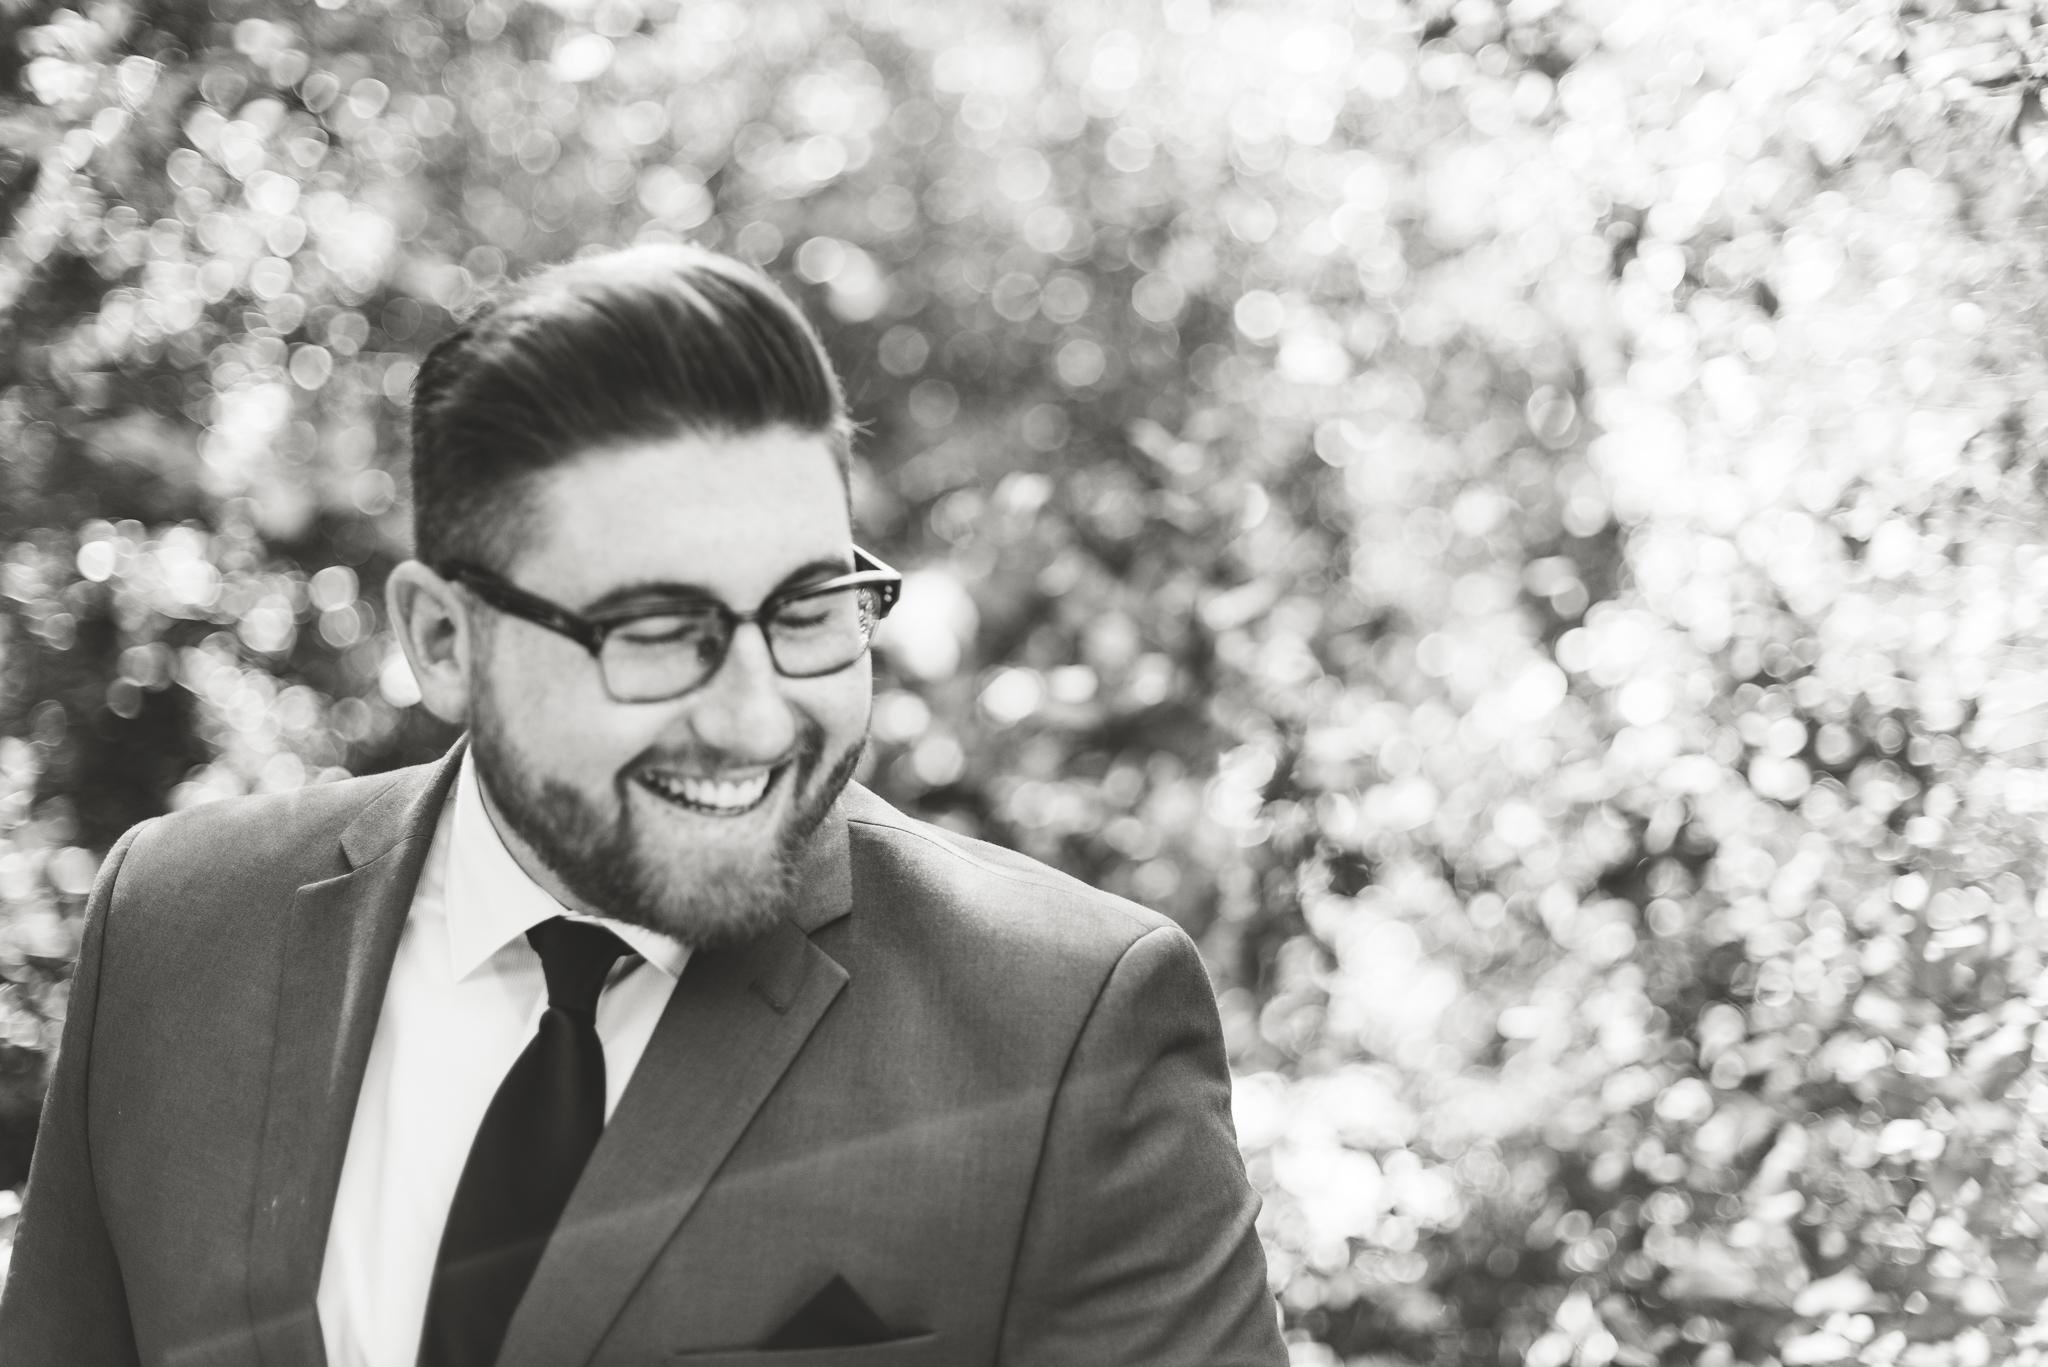 Isaiah & Taylor Photography - Los Angeles Lifestyle Wedding Photographer-6.jpg